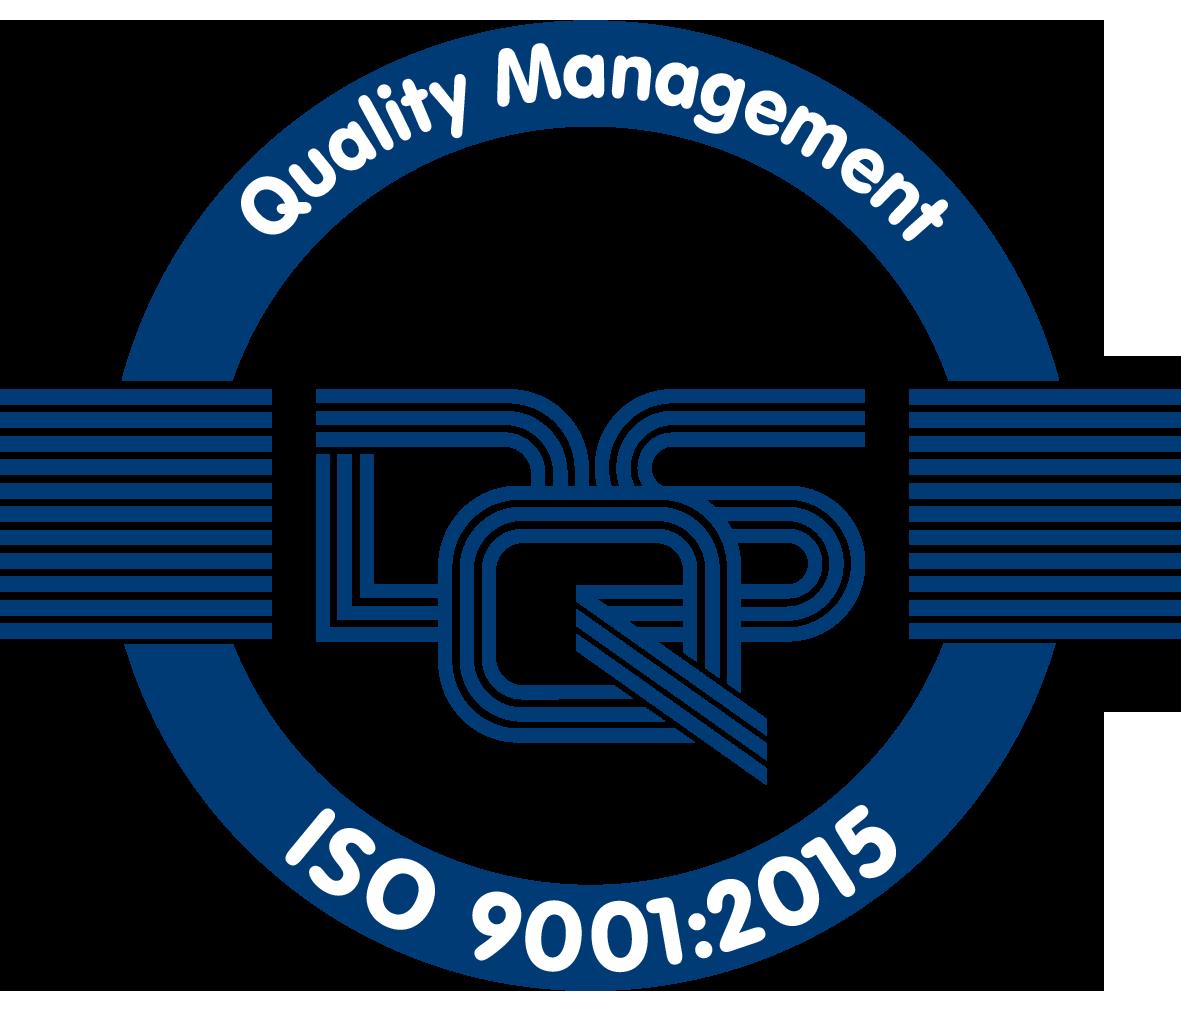 DQS_Certificate_Symbols_ISO9001_2015